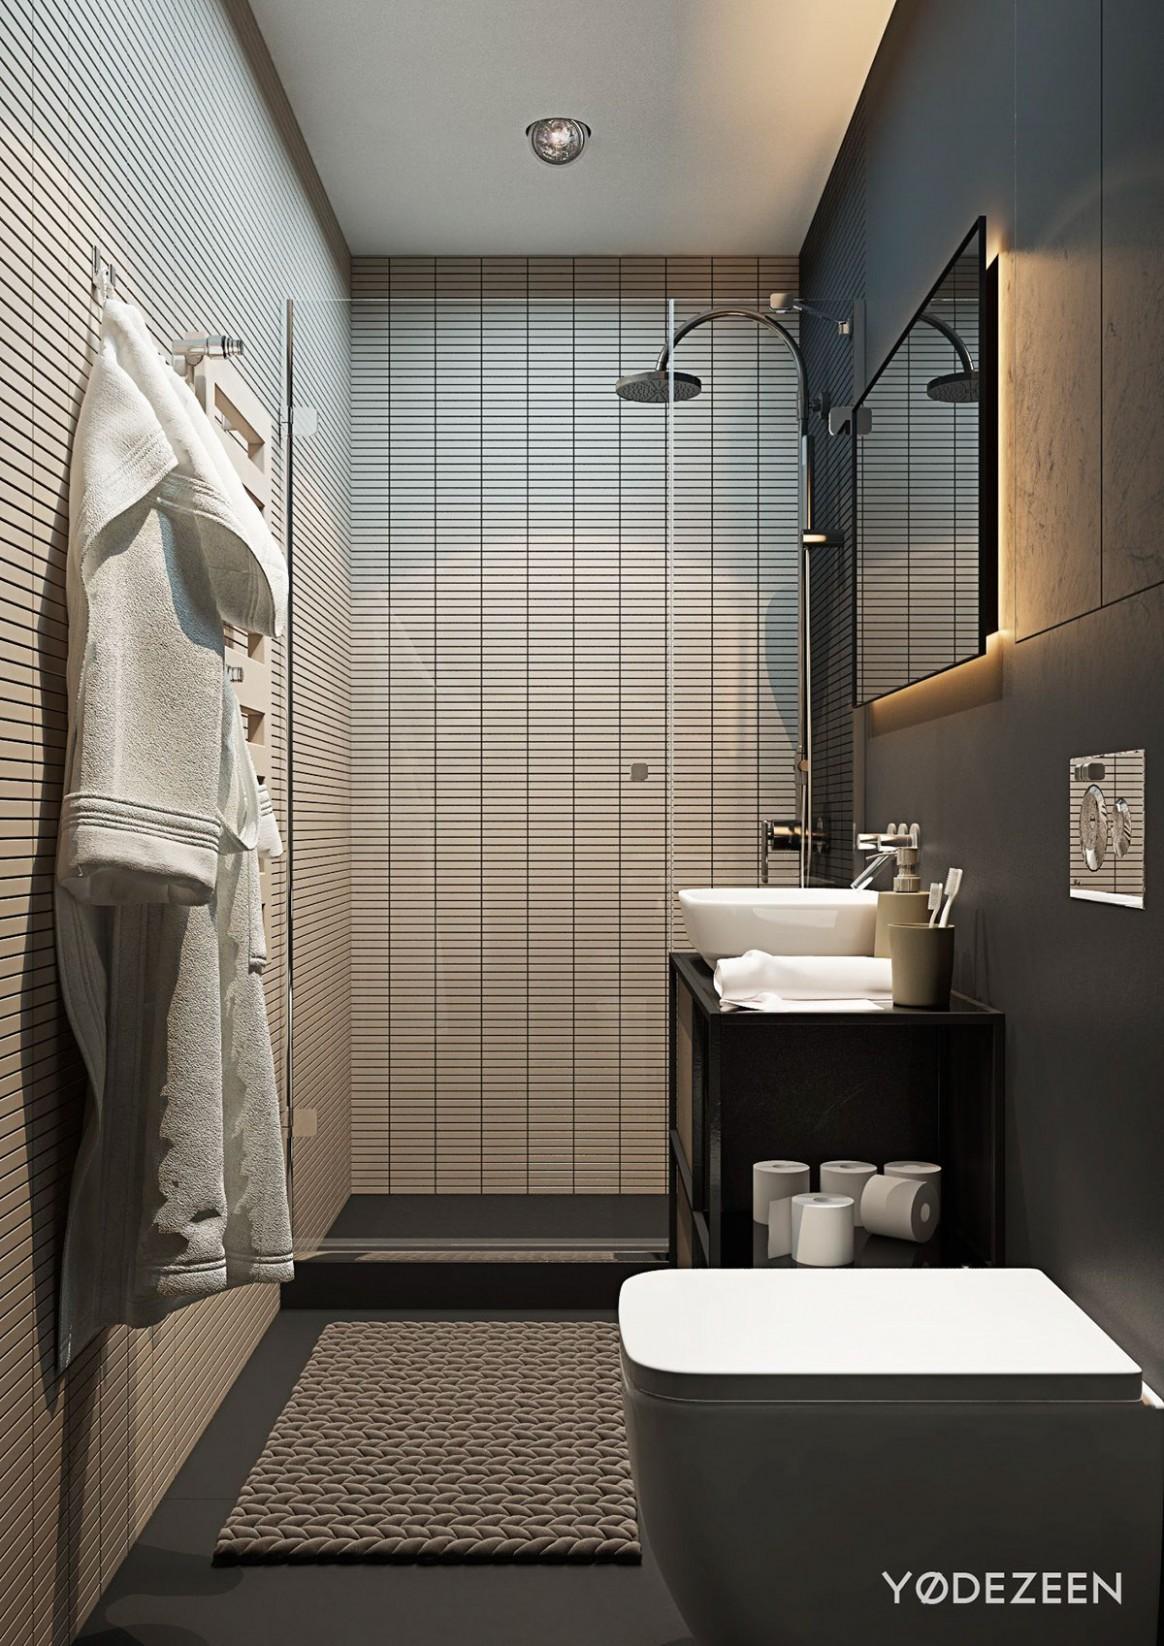 12 Small Studio Apartments With Beautiful Design - Apartment Washroom Design